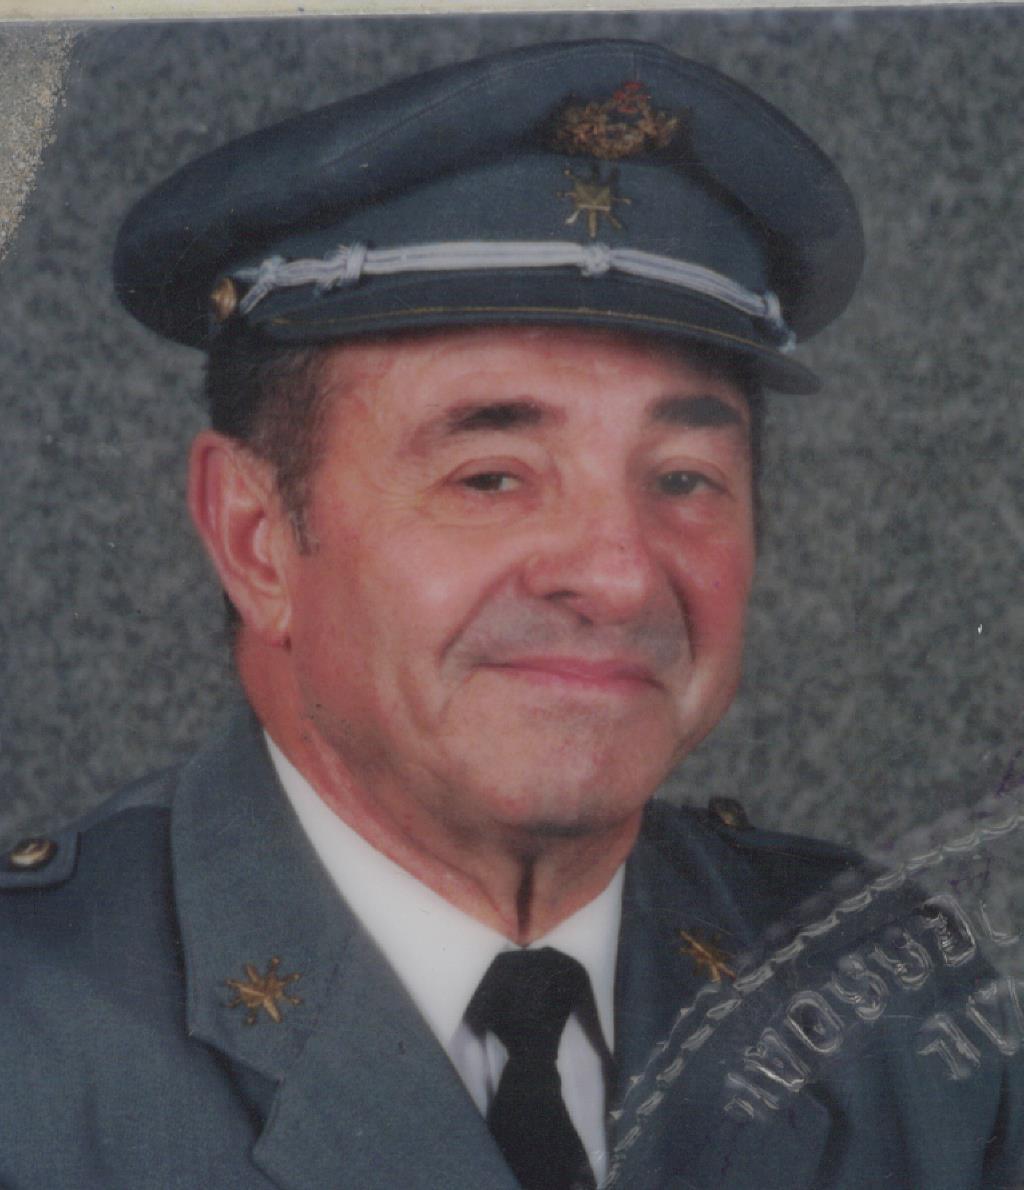 António Sanches